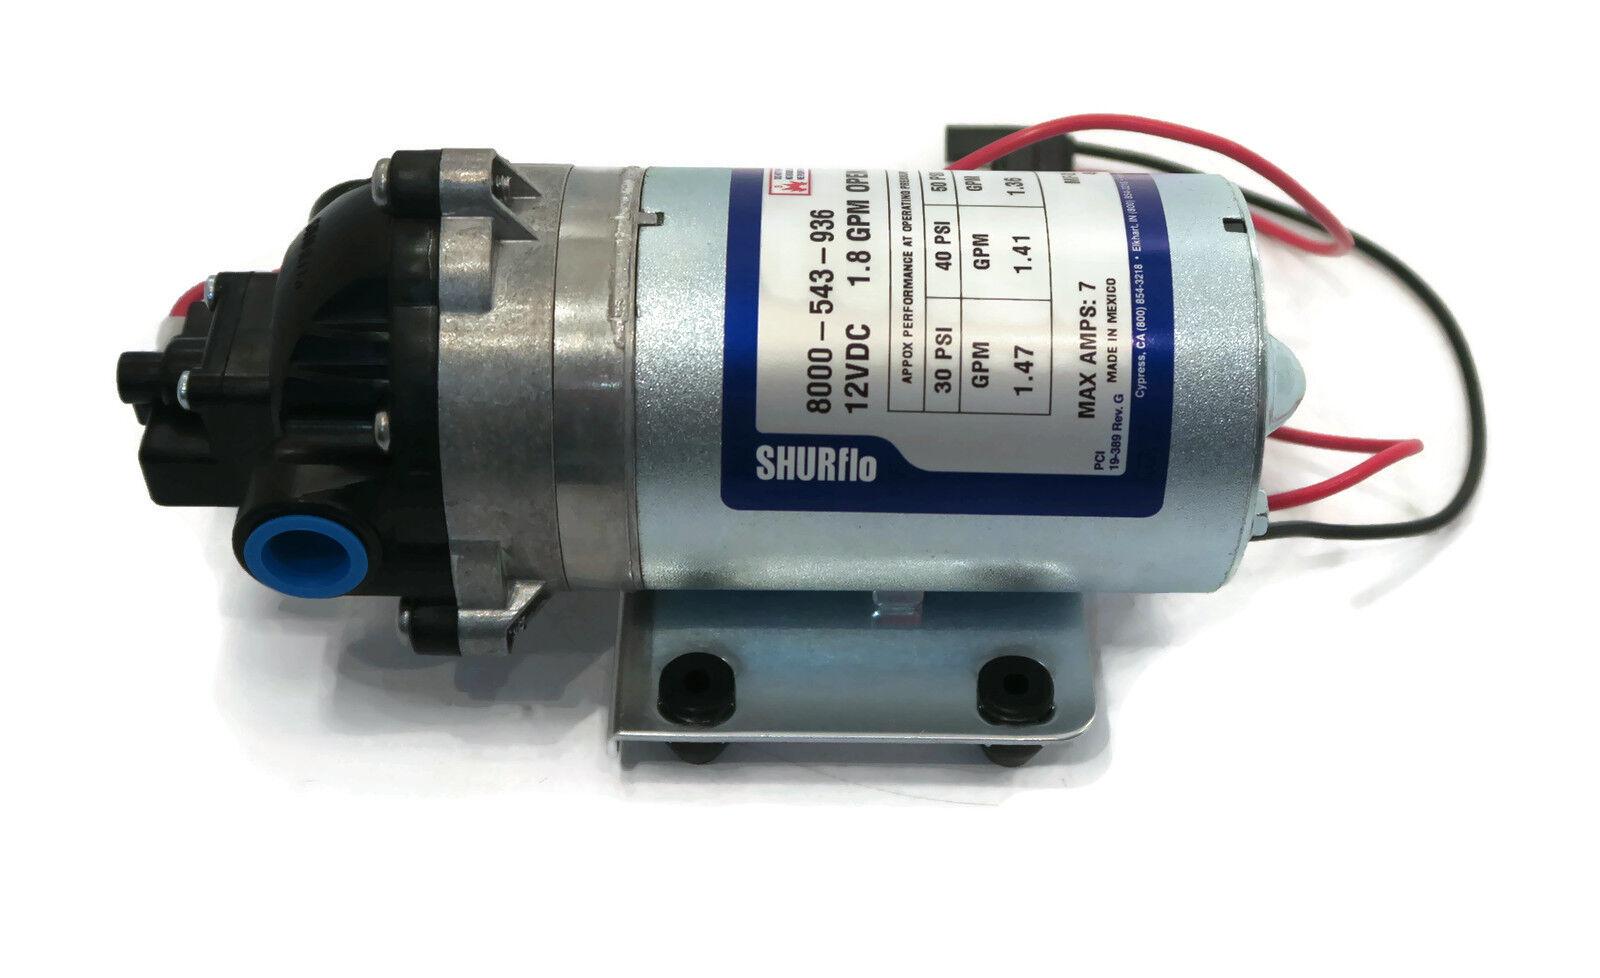 New Shurflo 12v Volt Demand Water Pump W Wiring Harness Camper Rv Trailer Boat